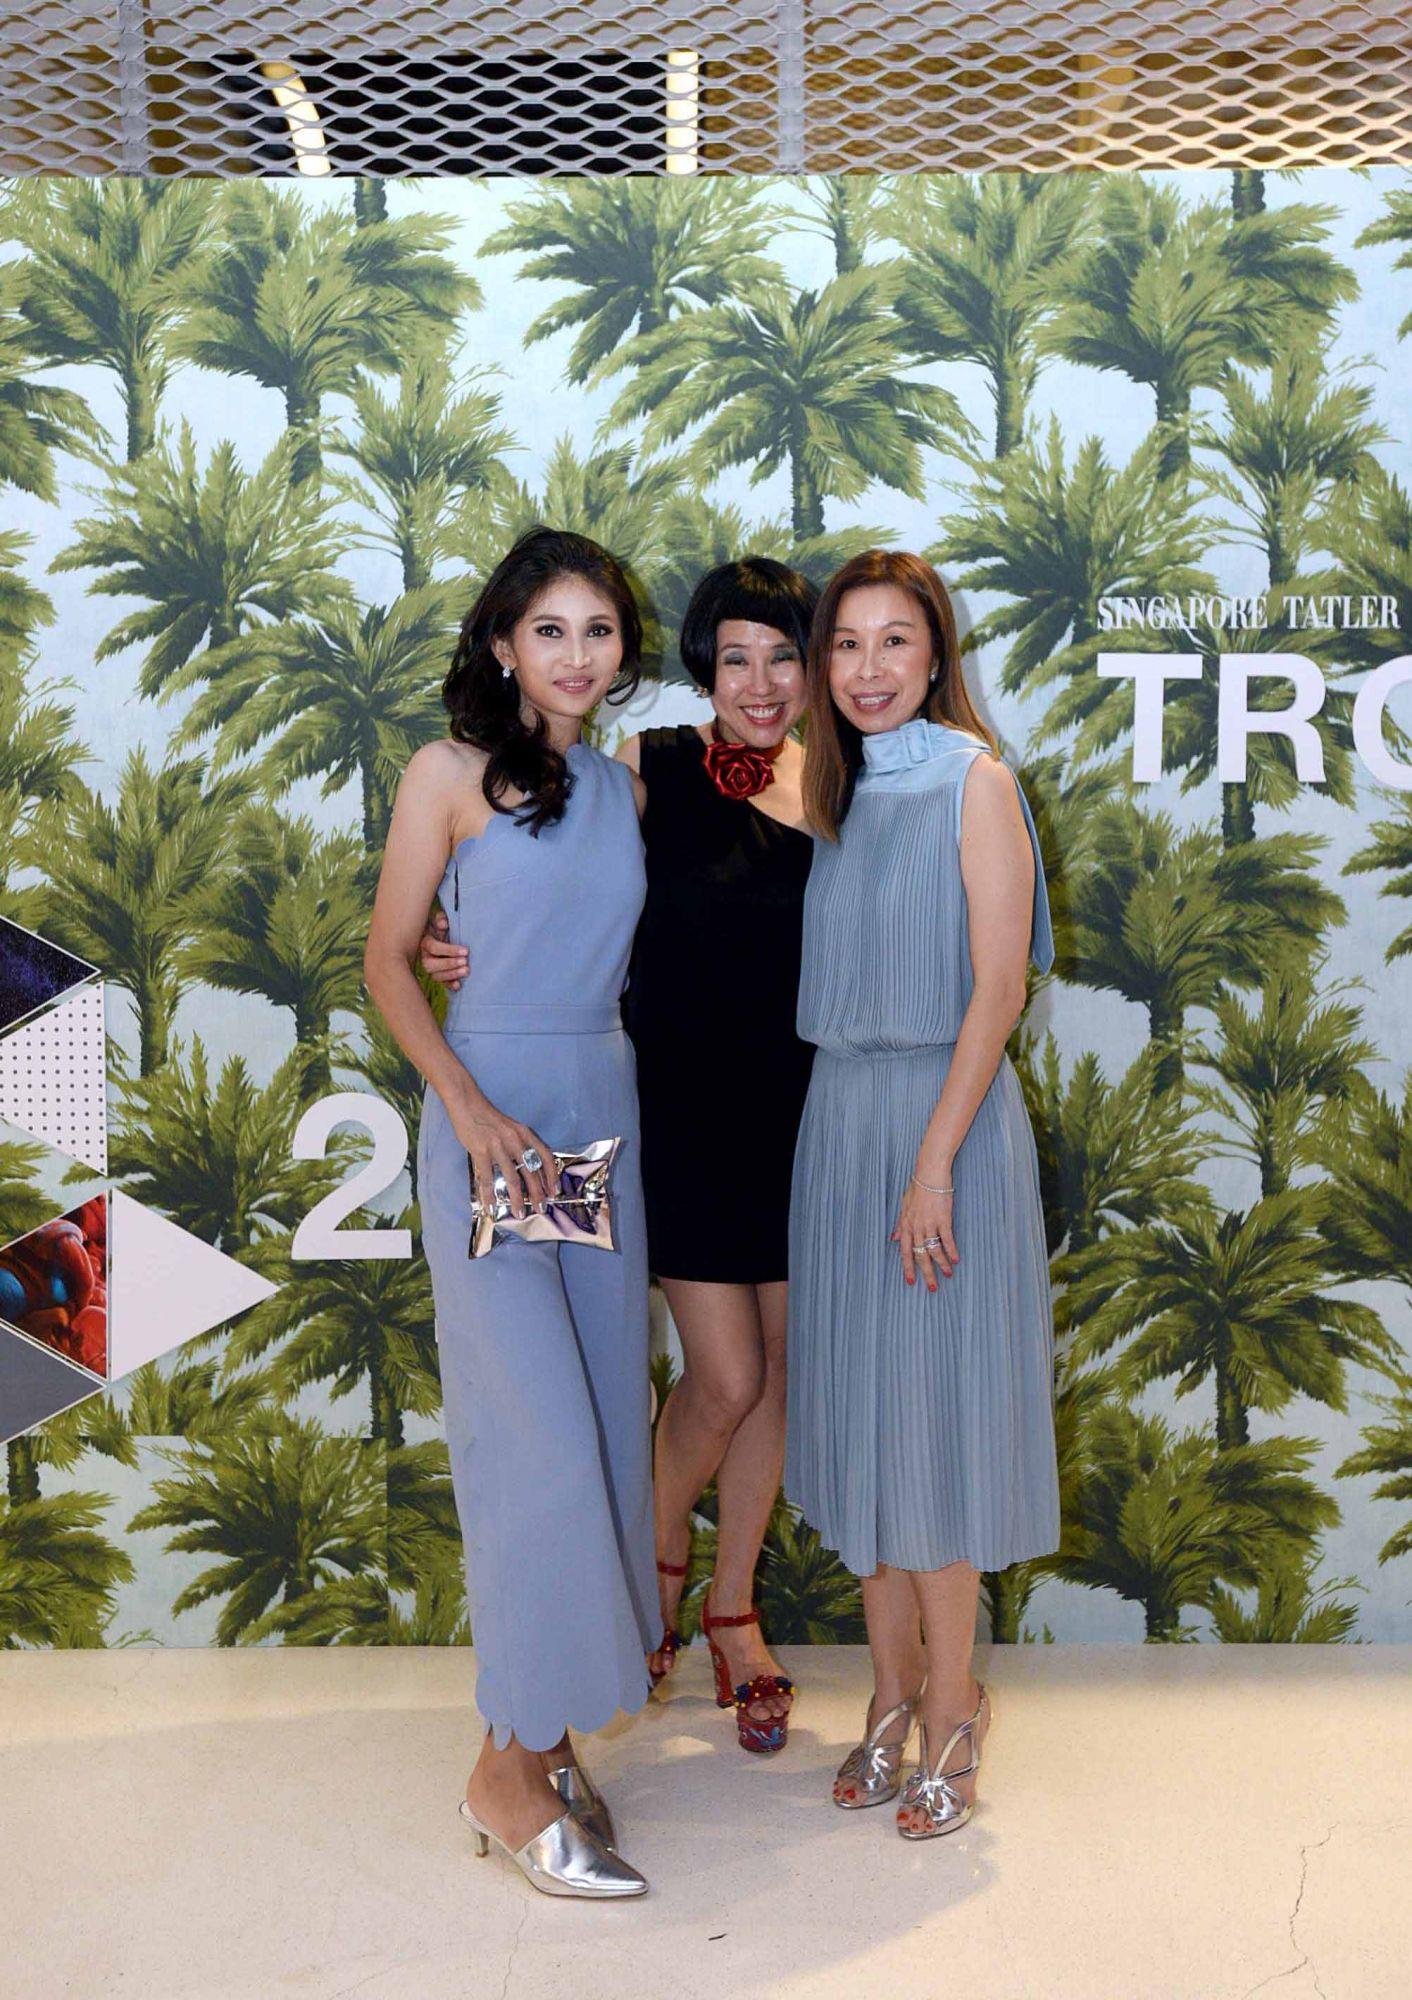 Karen Ong-Tan, Rosalynn Tay, Stephanie Tay